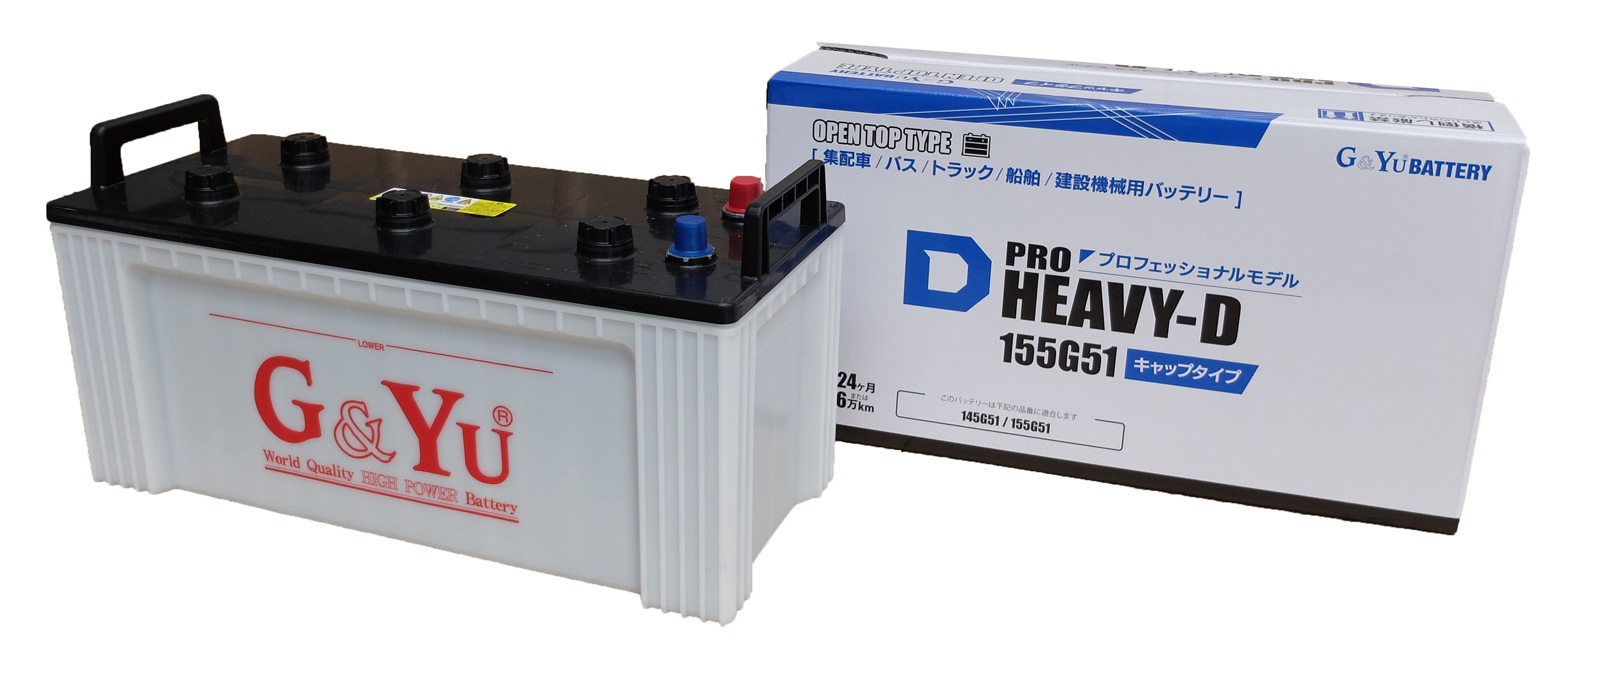 G&Yu バッテリー HD-155G51